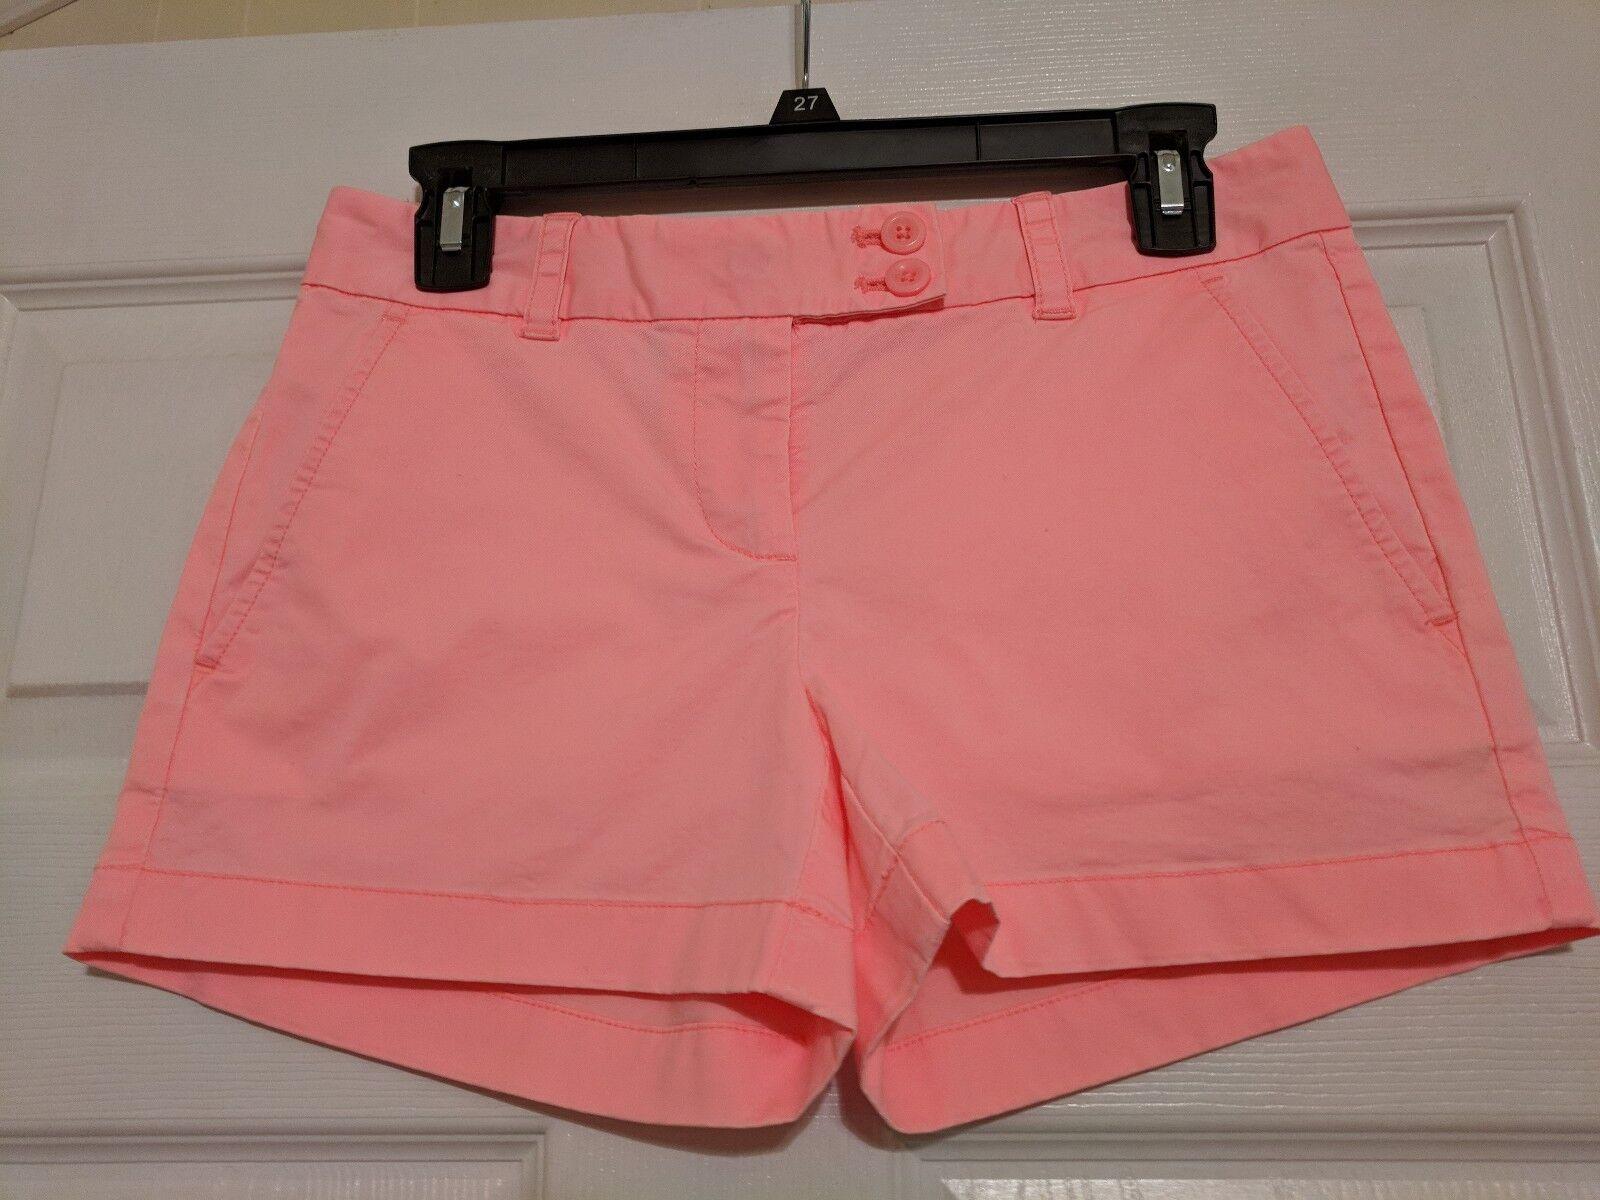 Vineyard Vines Women's Size 00 Pink Shorts - NWOT